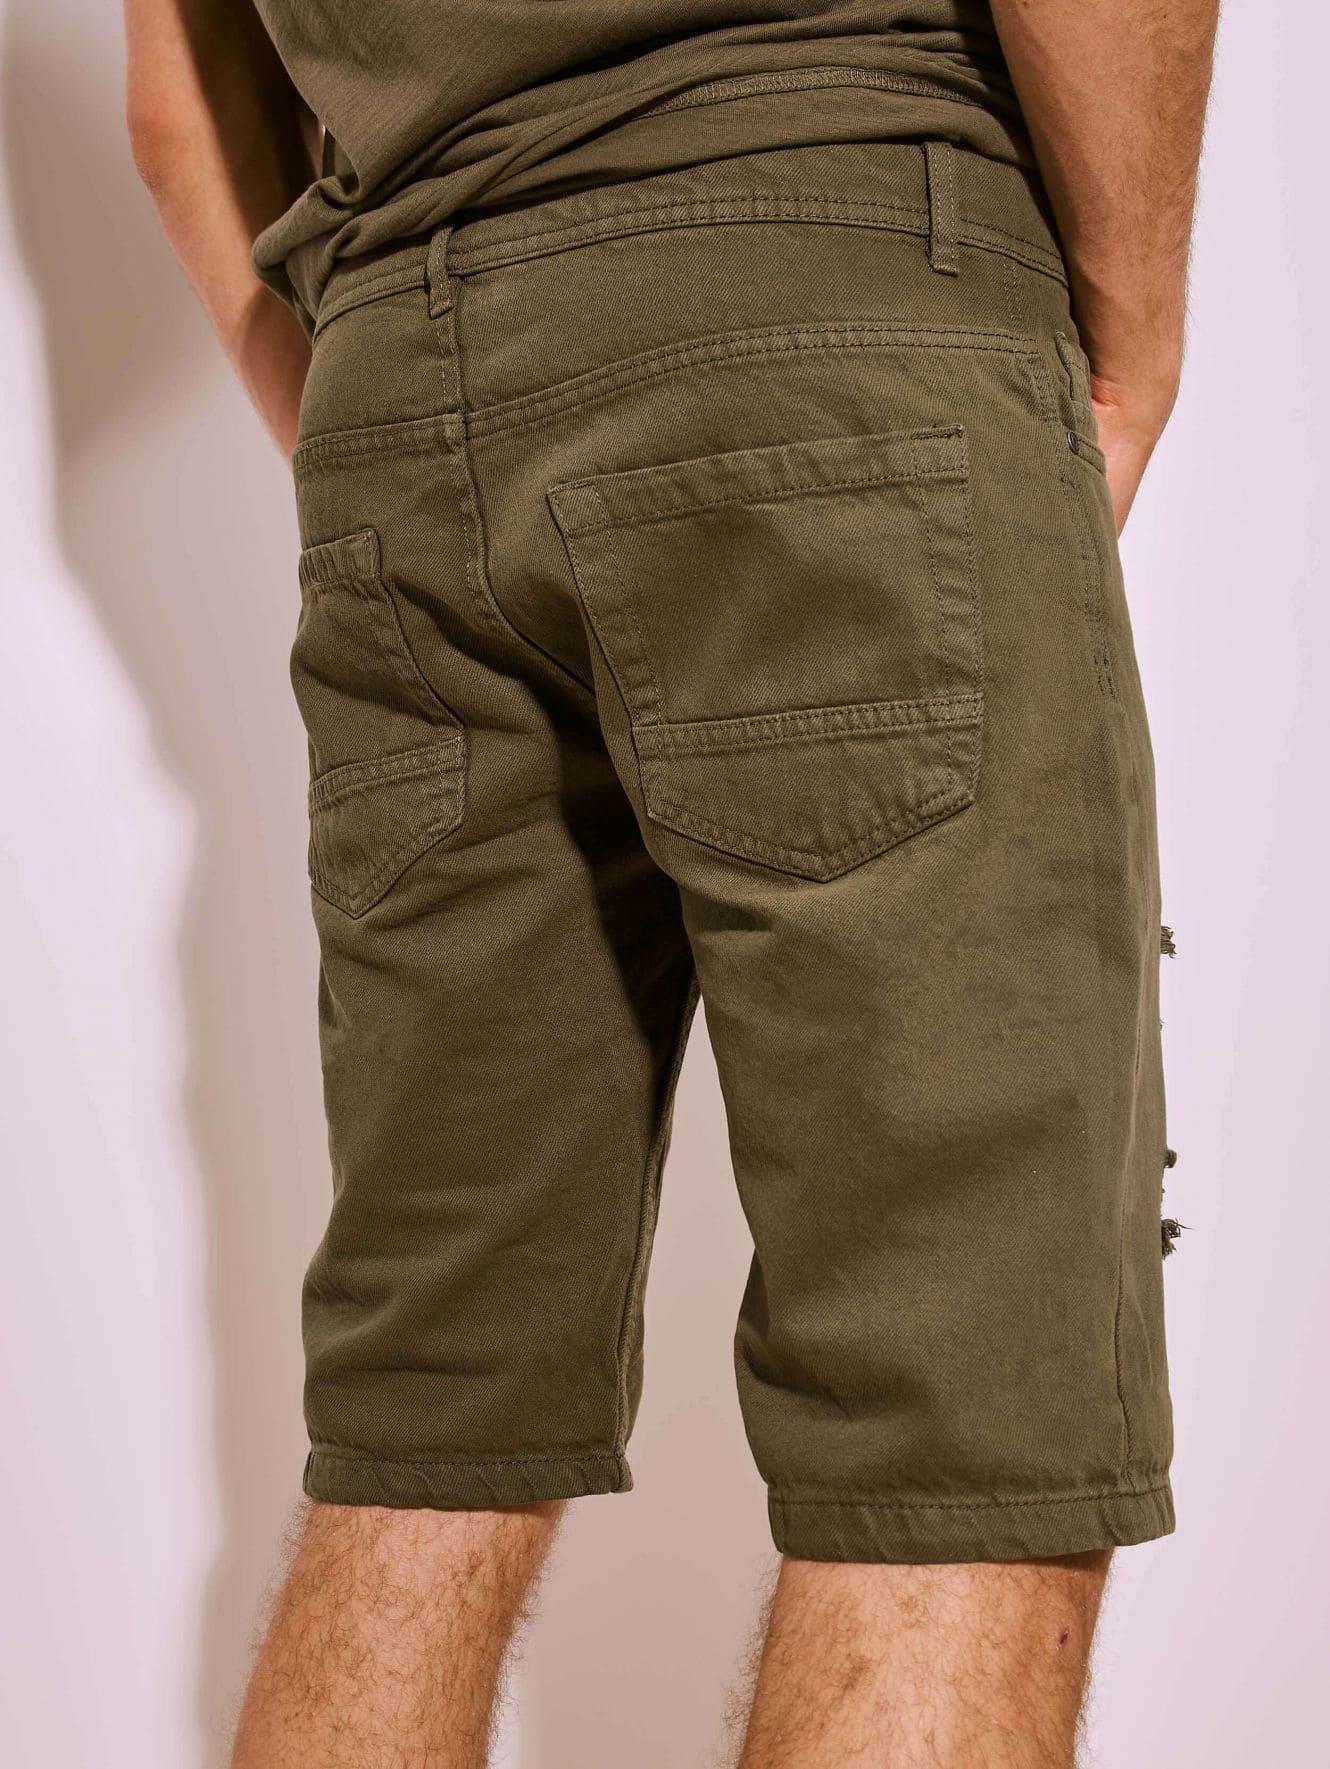 Pantalone Corto Uomo Terranova